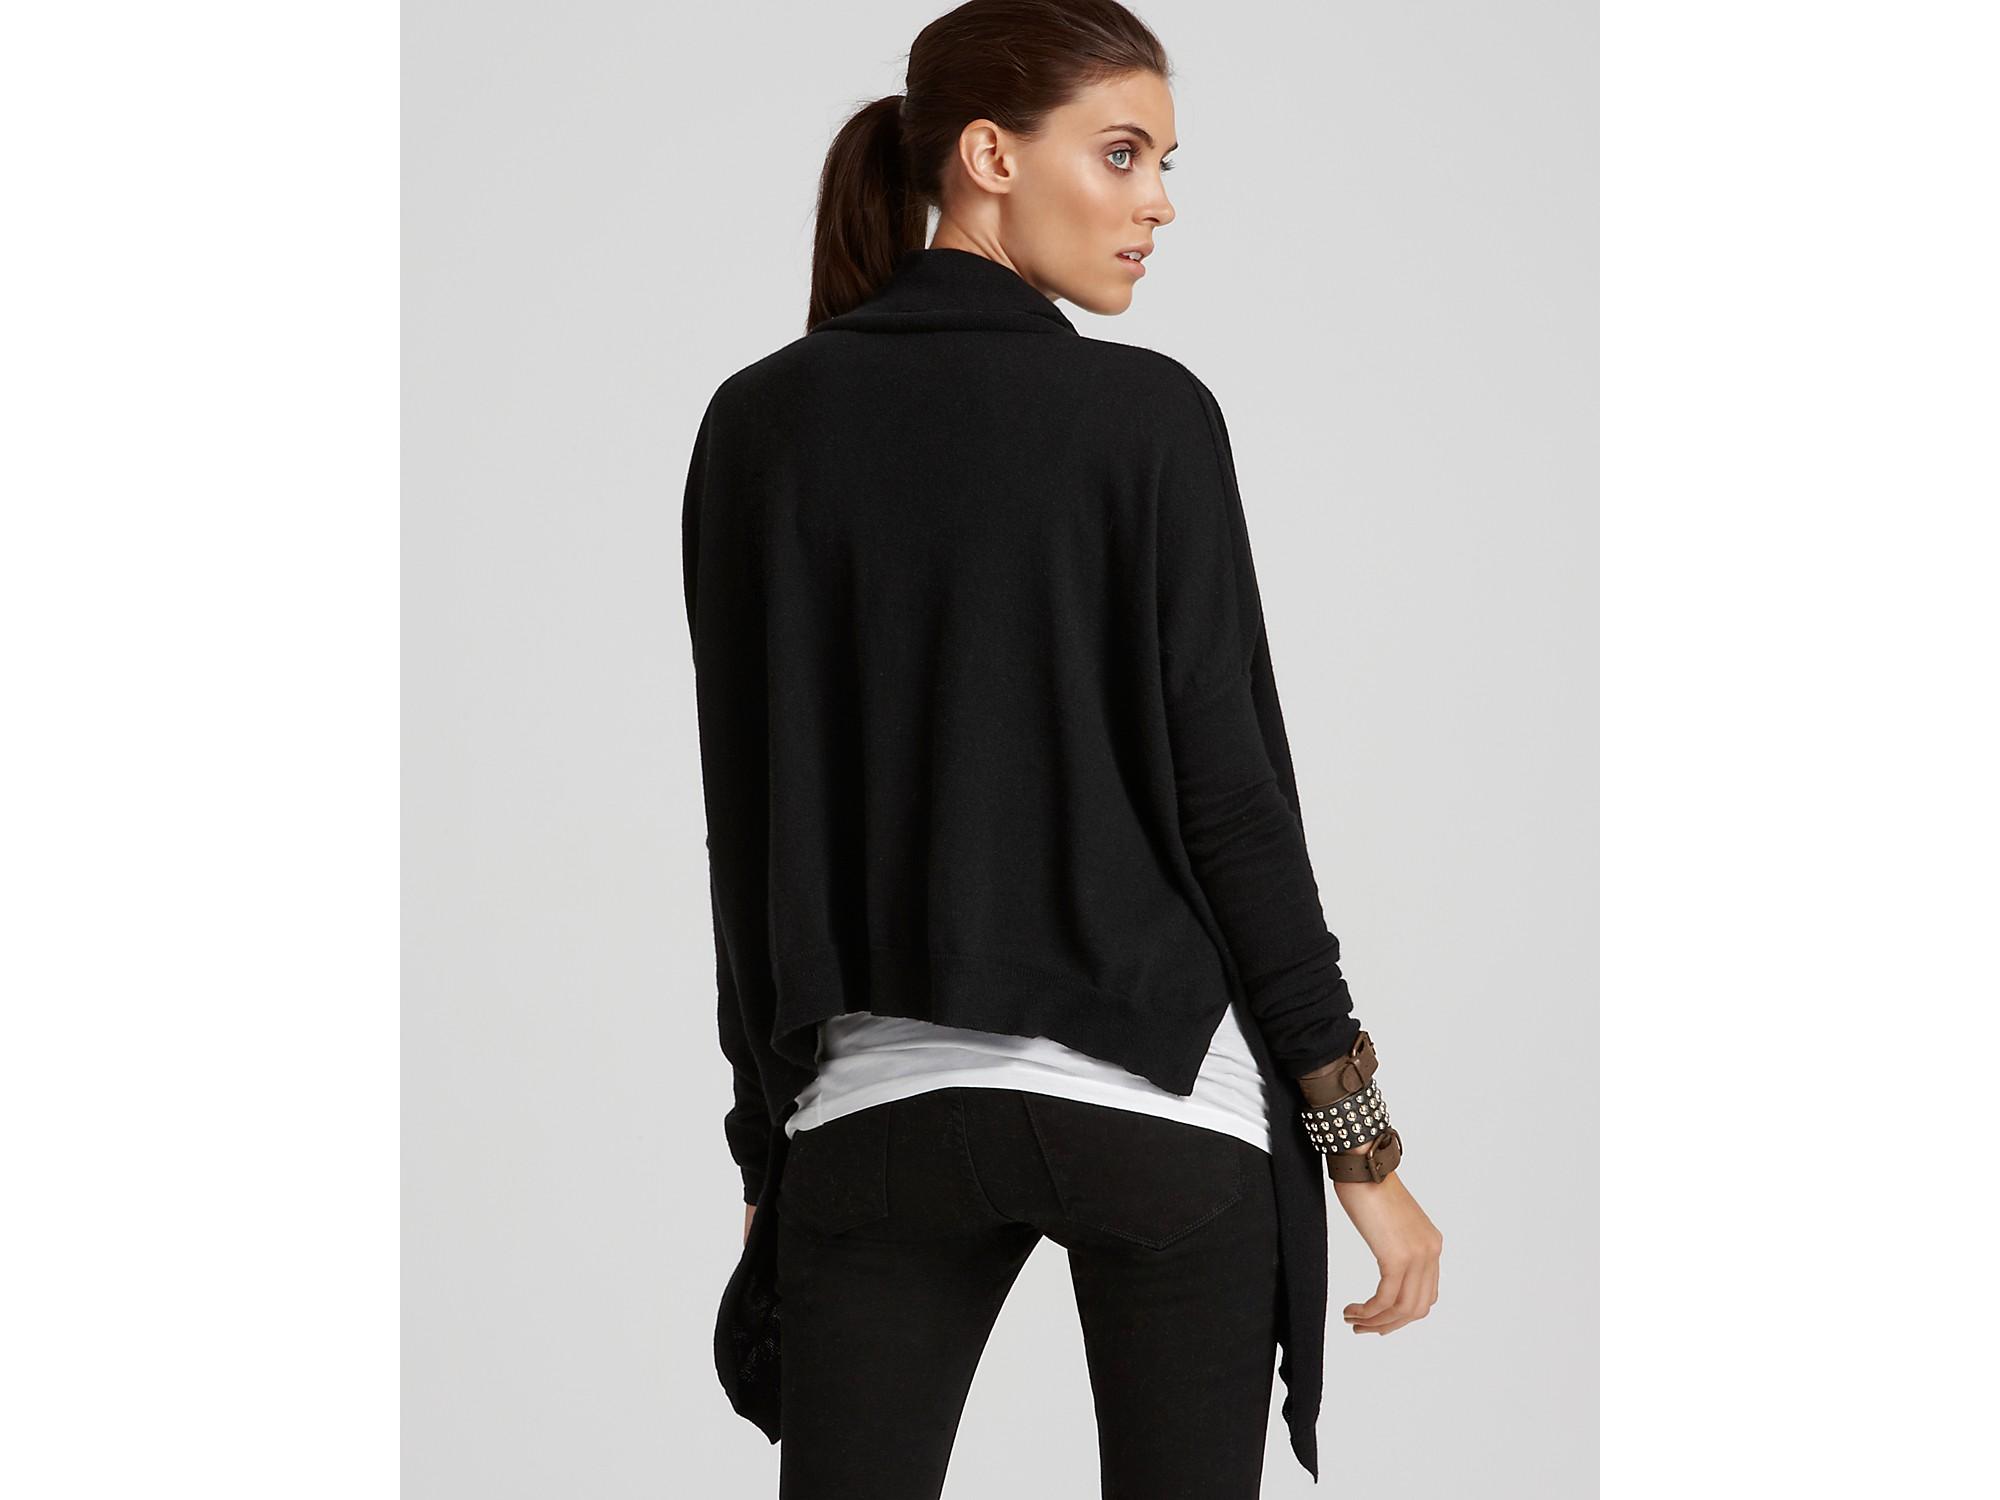 Helmut lang Oversized Cowlneck Sweater in Black | Lyst